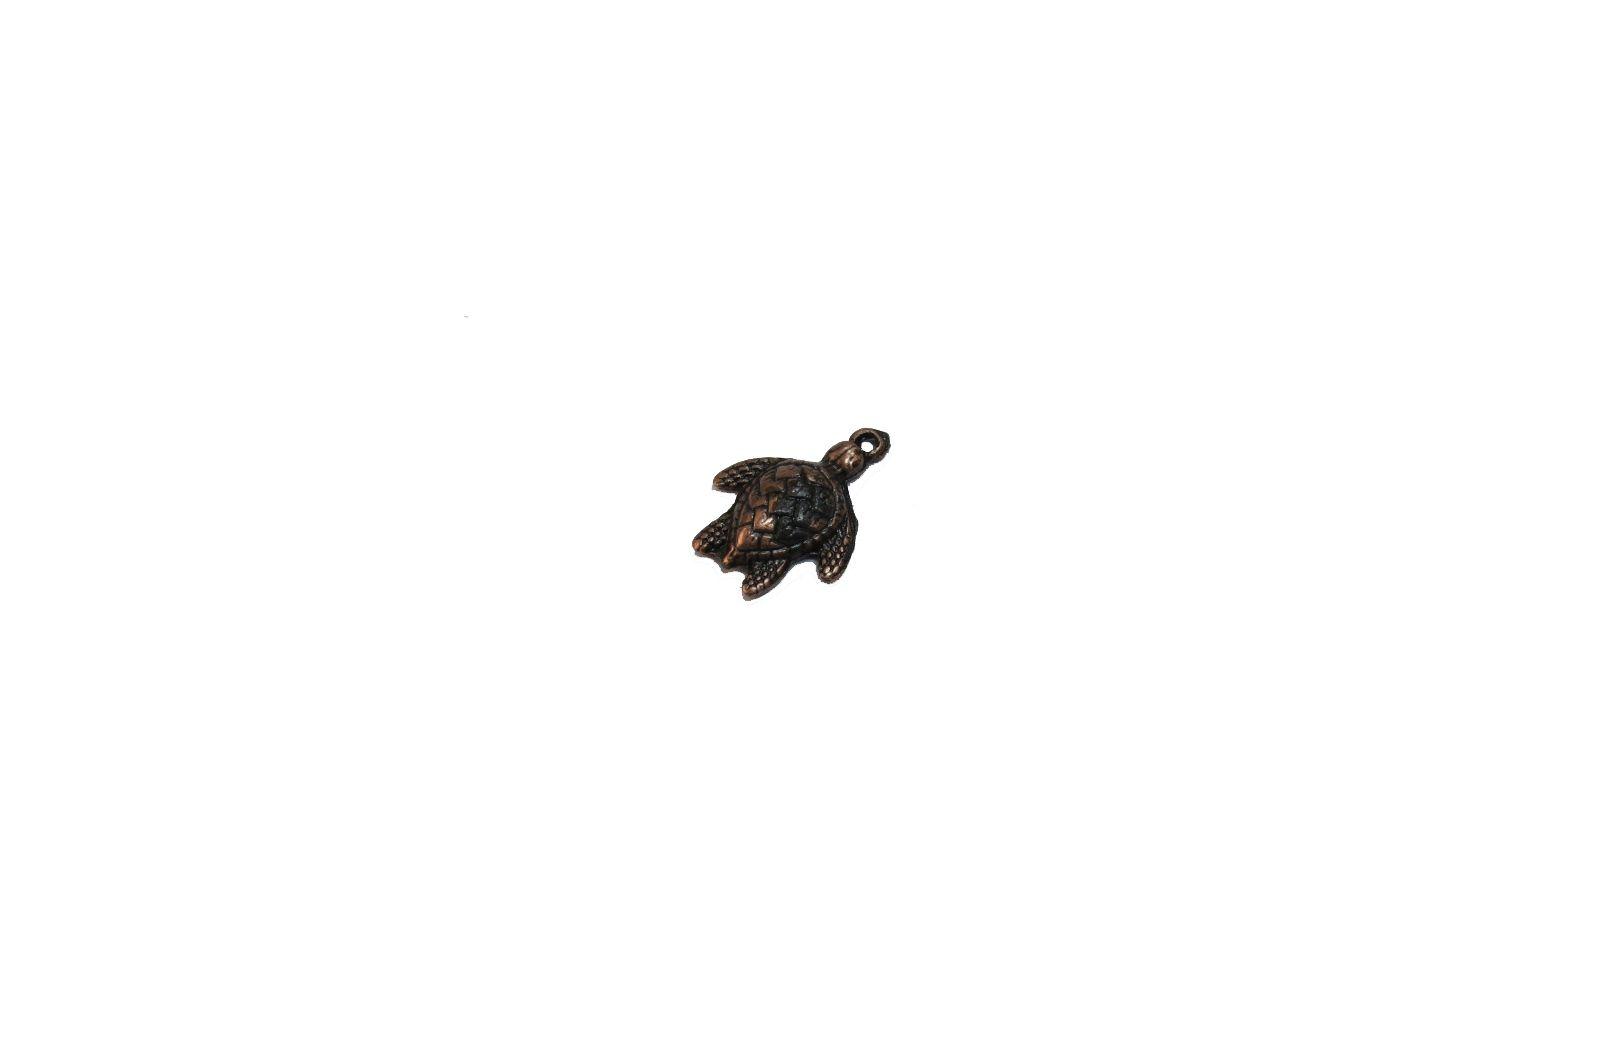 001 - Tartaruga Xangô